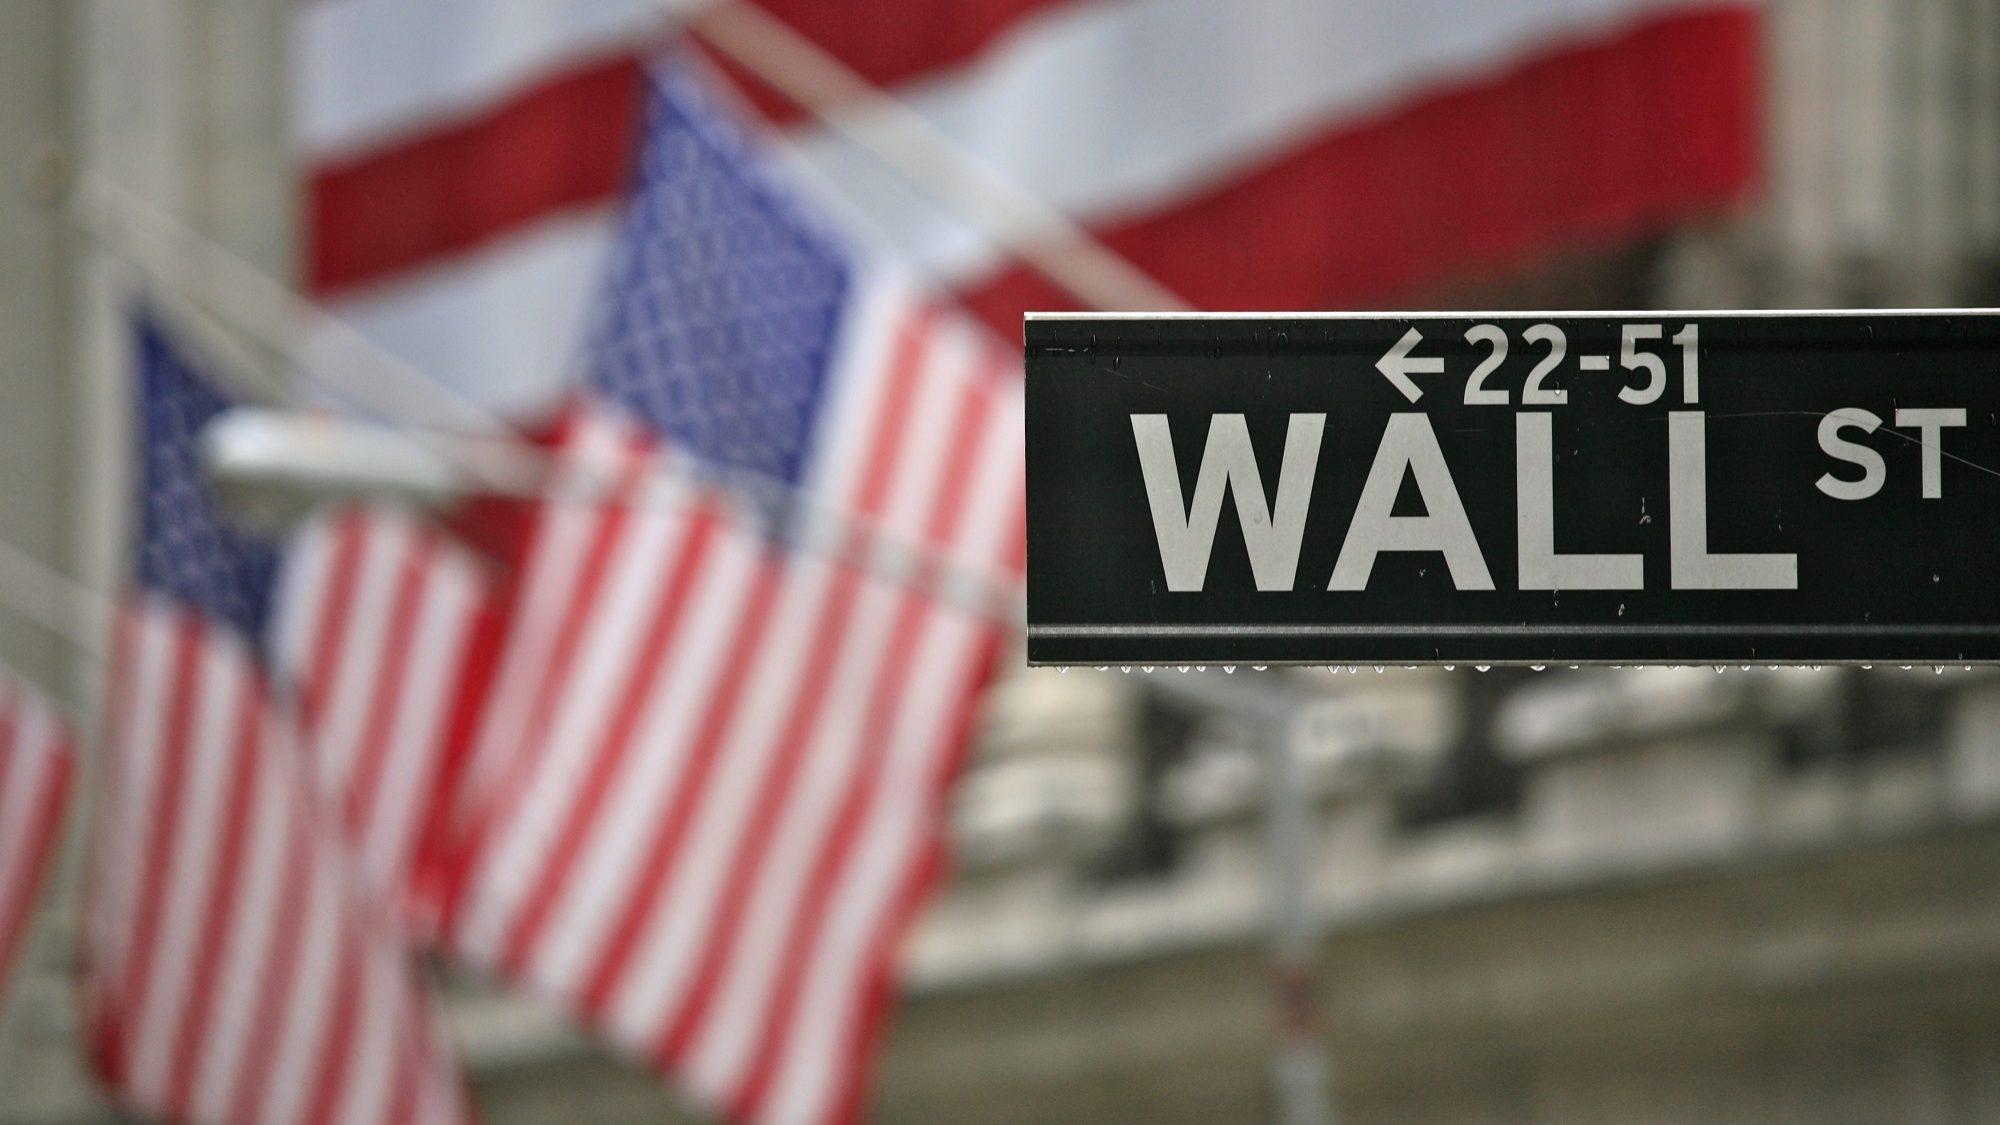 Wall Street recupera após vaga de vendas com guerra comercial